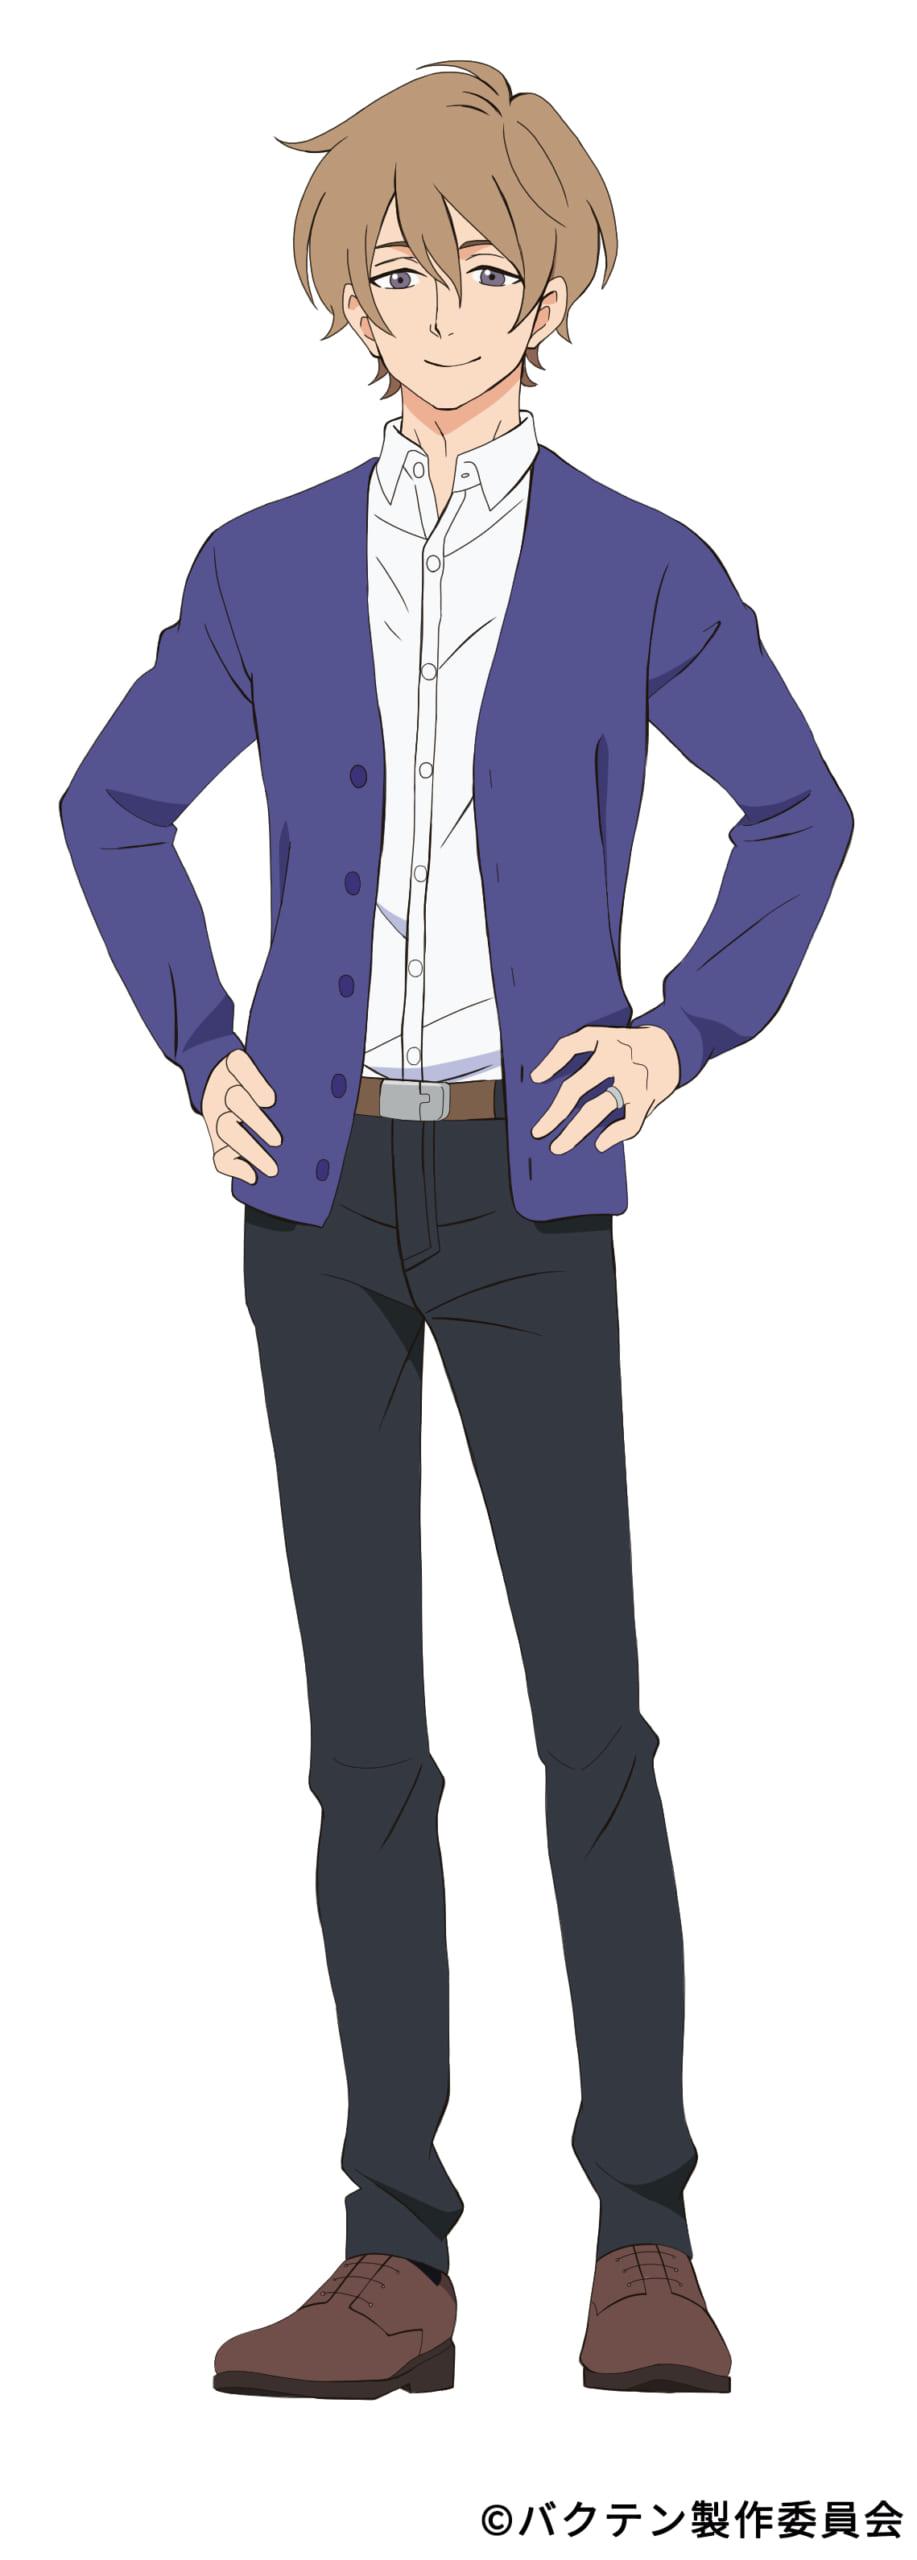 TVアニメ「バクテン!!」アオ高男子新体操部の監督・志田周作役に櫻井孝宏さんが決定!デフォルメキャラデザインも公開